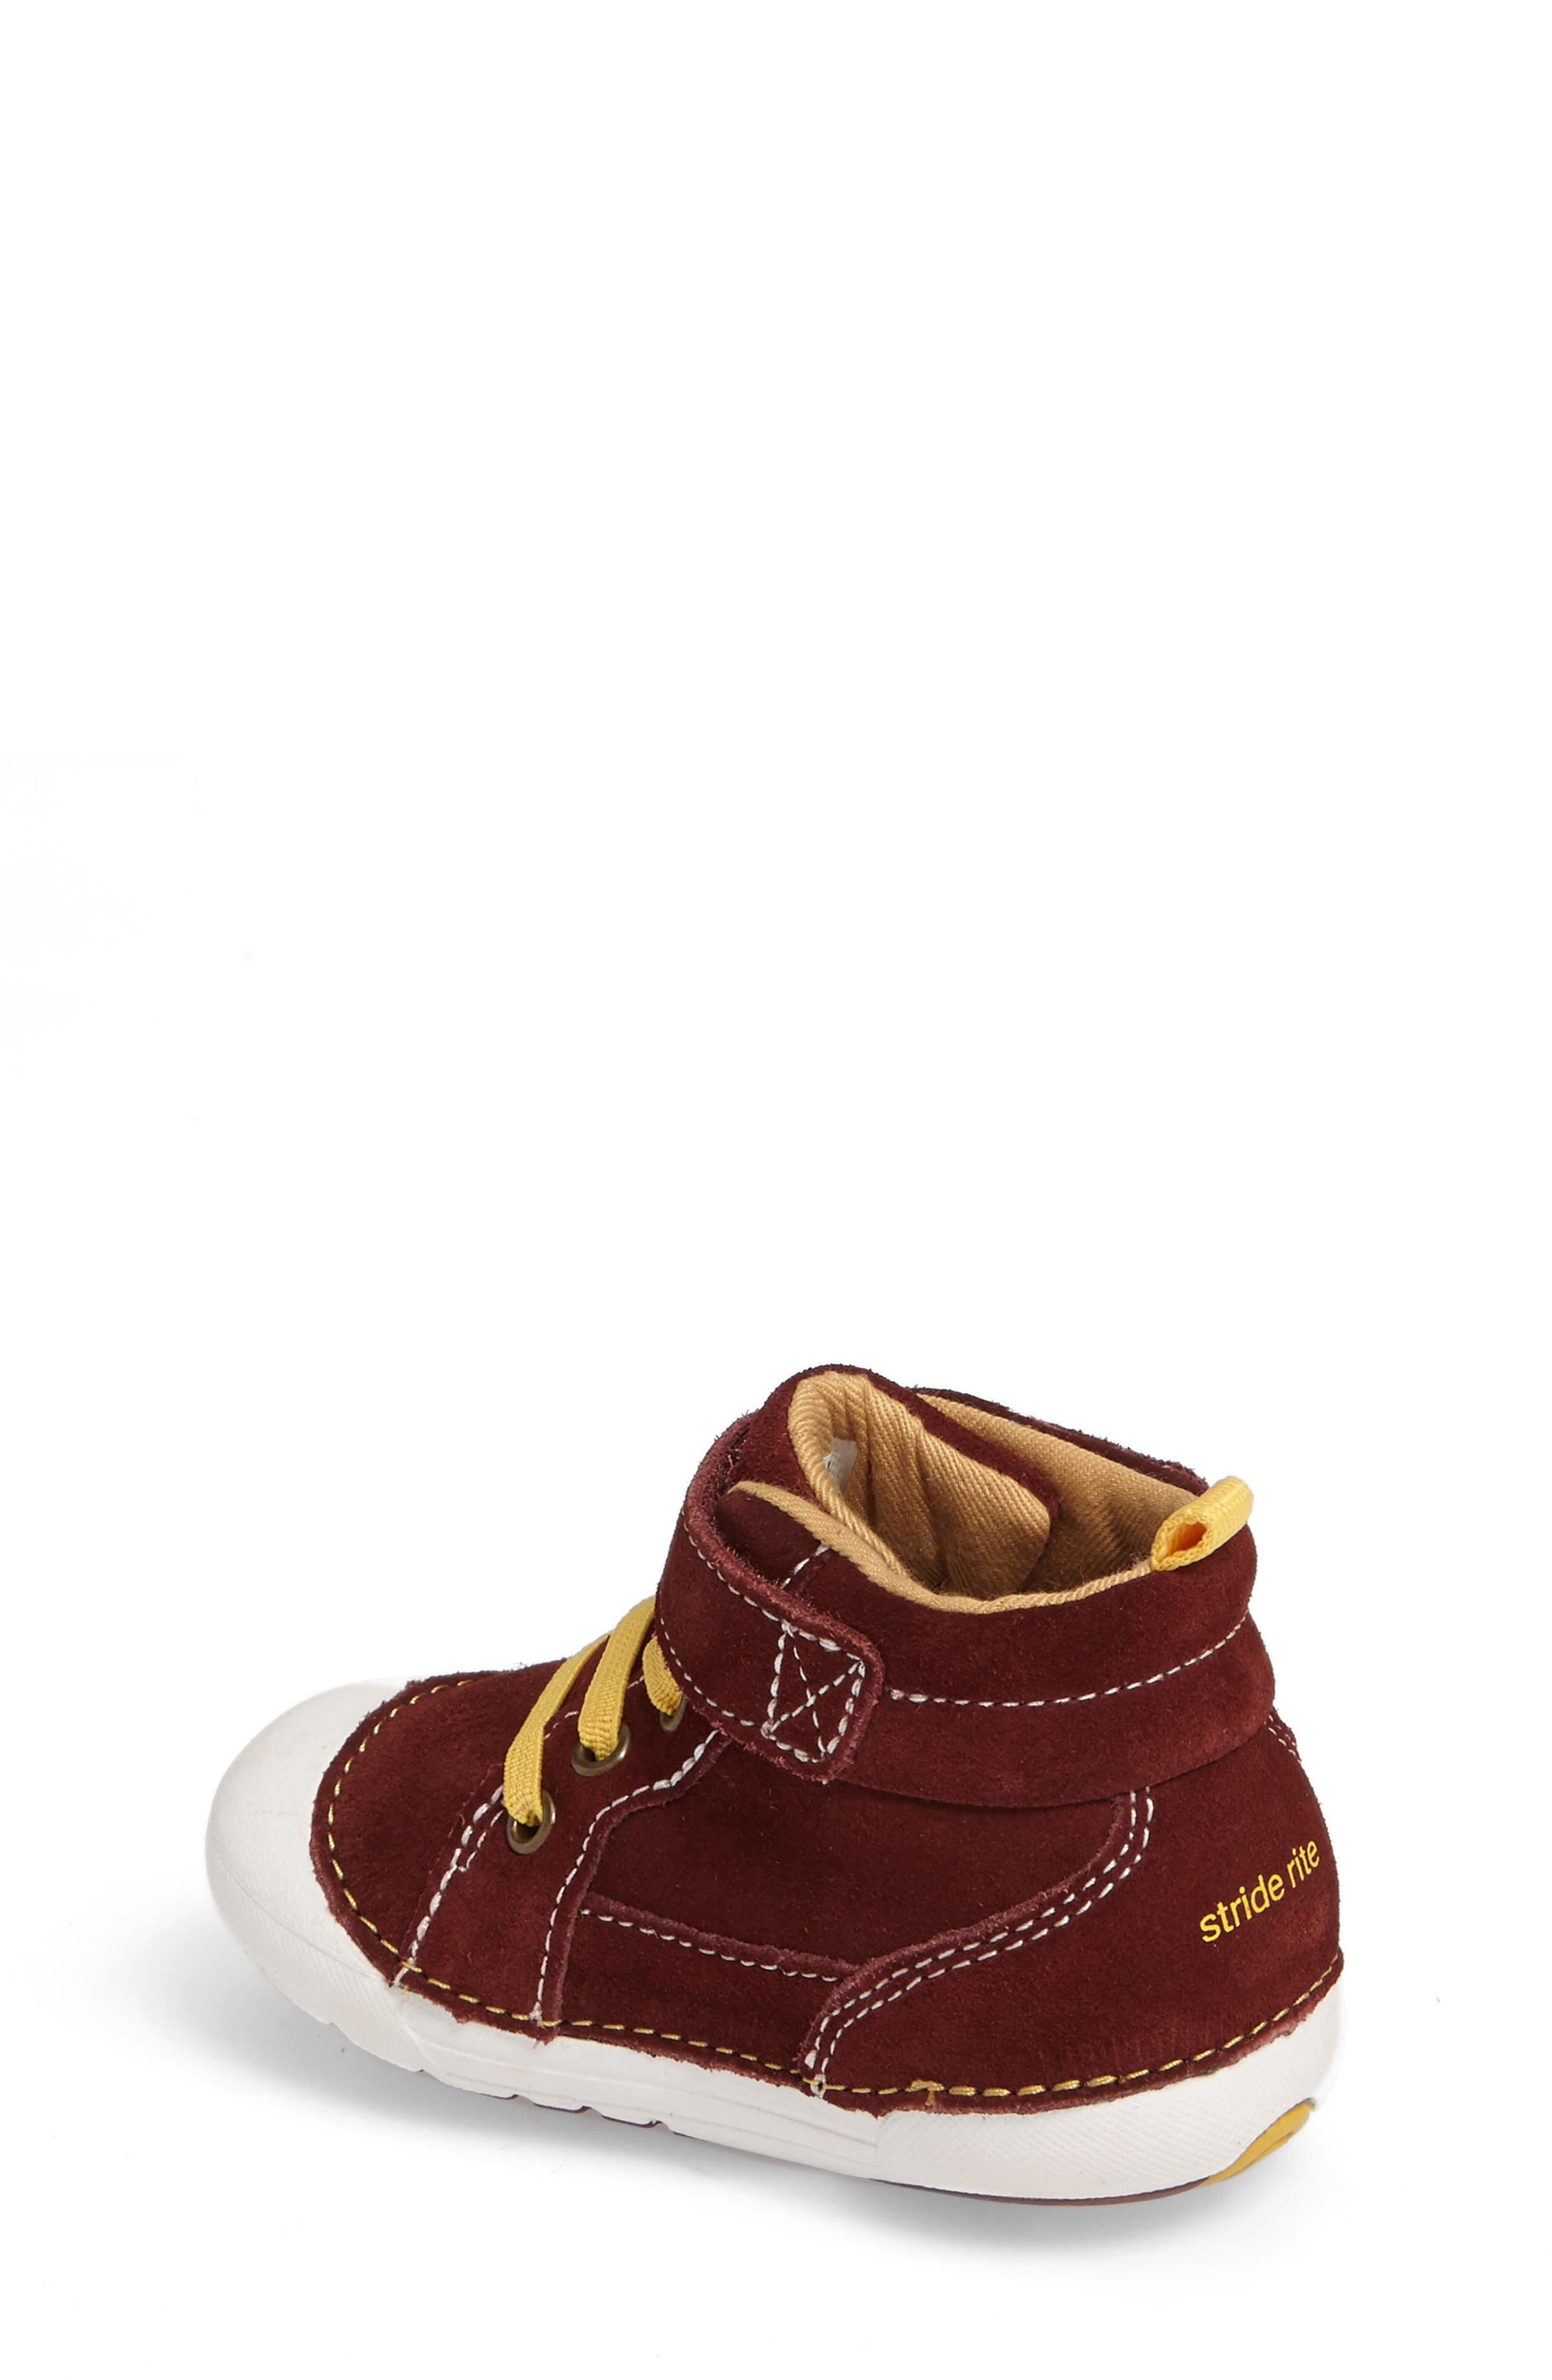 Alternate Image 2  - Stride Rite Soft Motion Danny Sneaker (Baby & Walker)